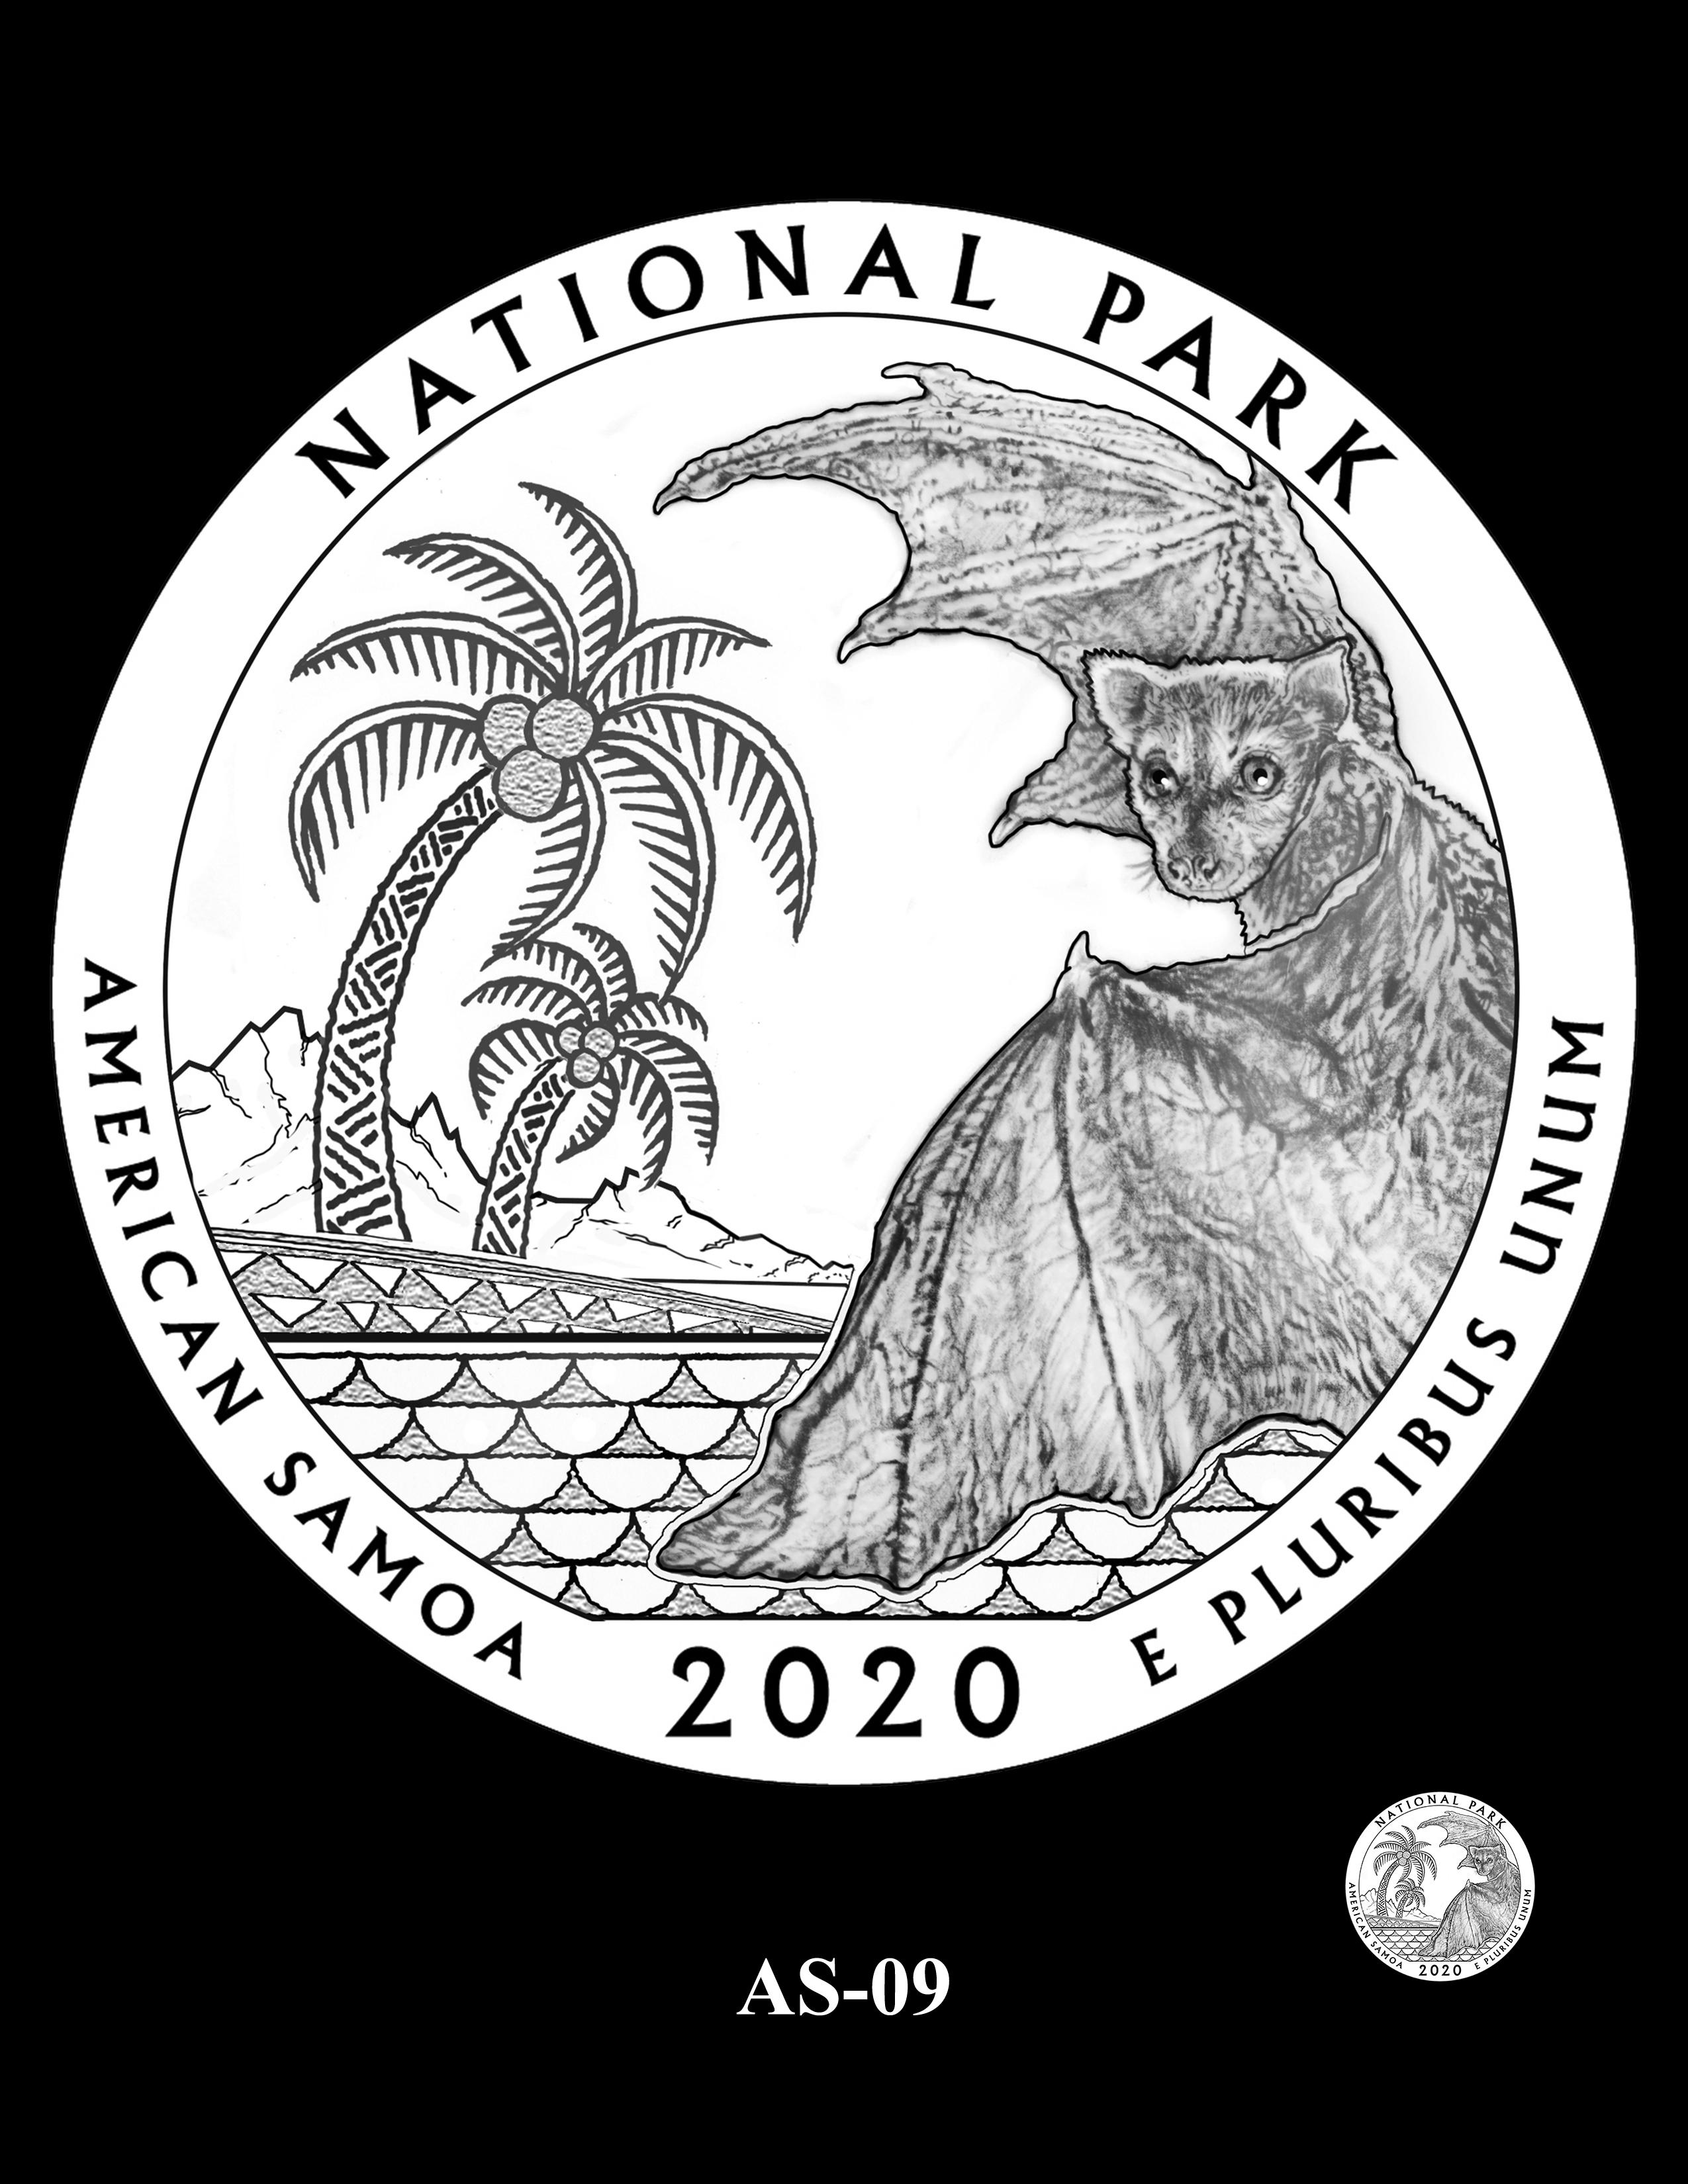 AS-09 -- 2020 America the Beautiful Quarters® Program